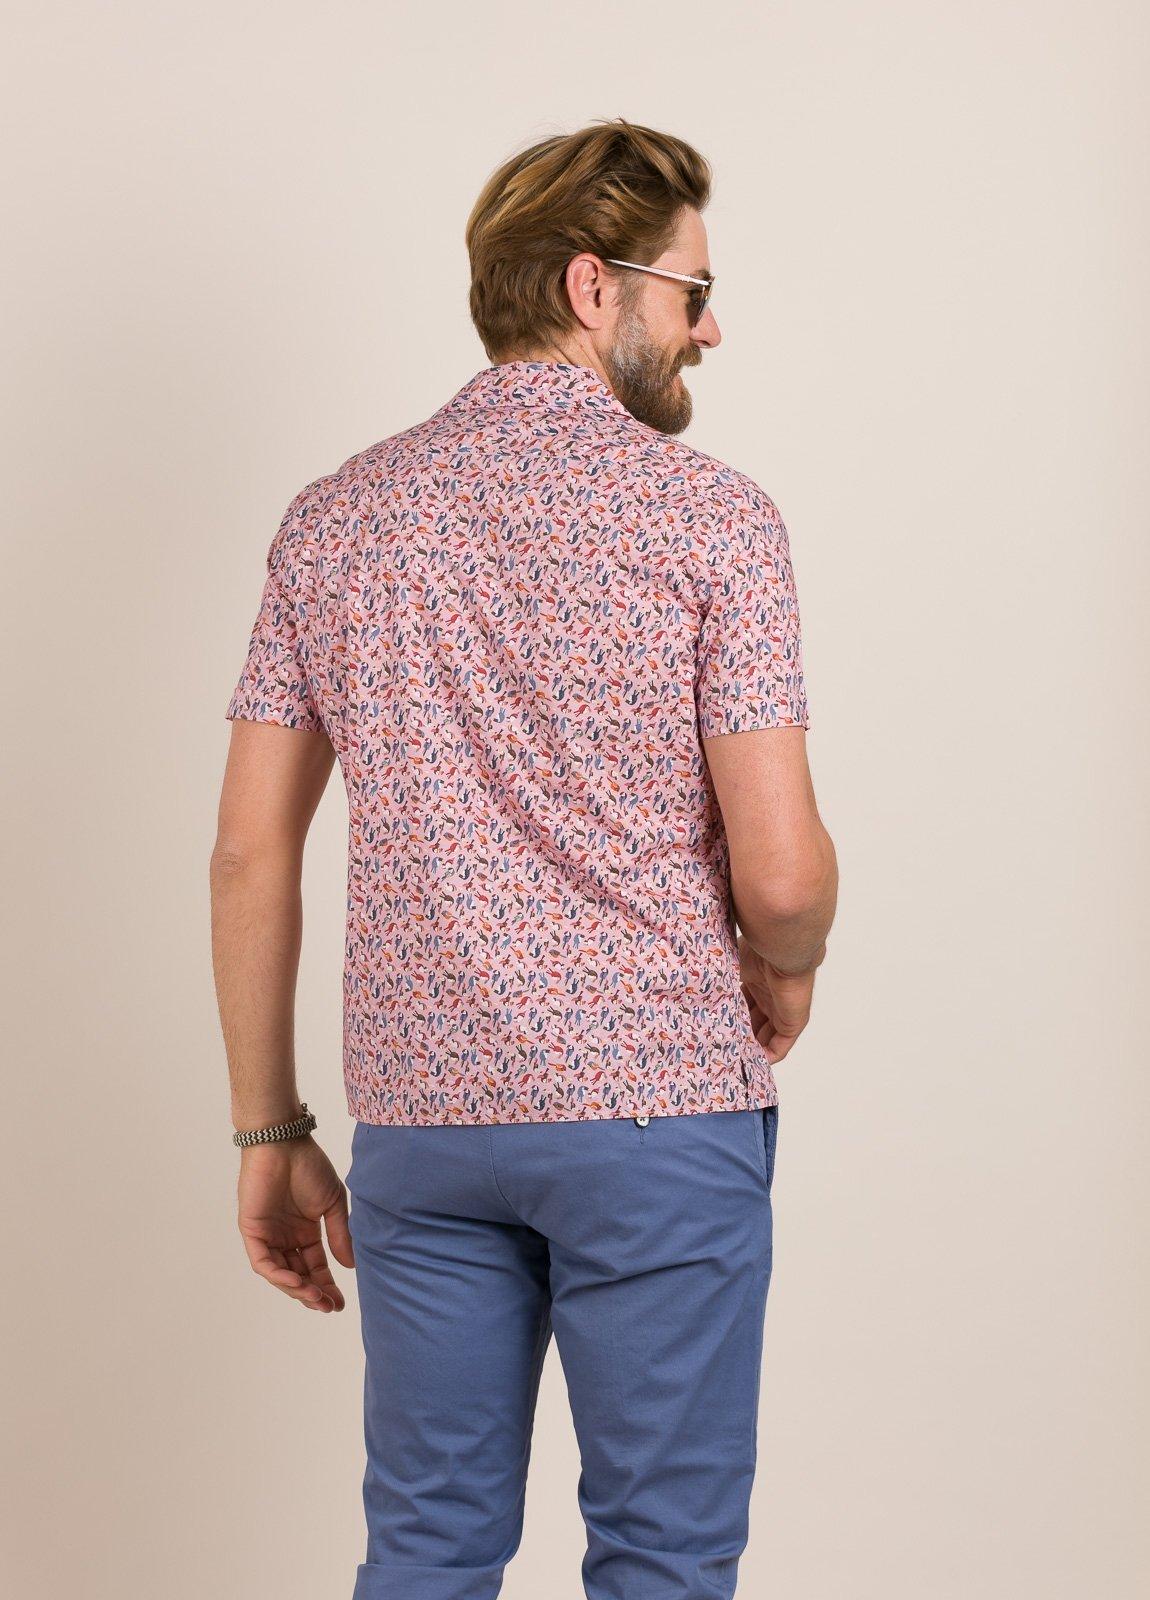 Camisa sport FUREST COLECCIÓN modelo HAWAI rosa - Ítem4